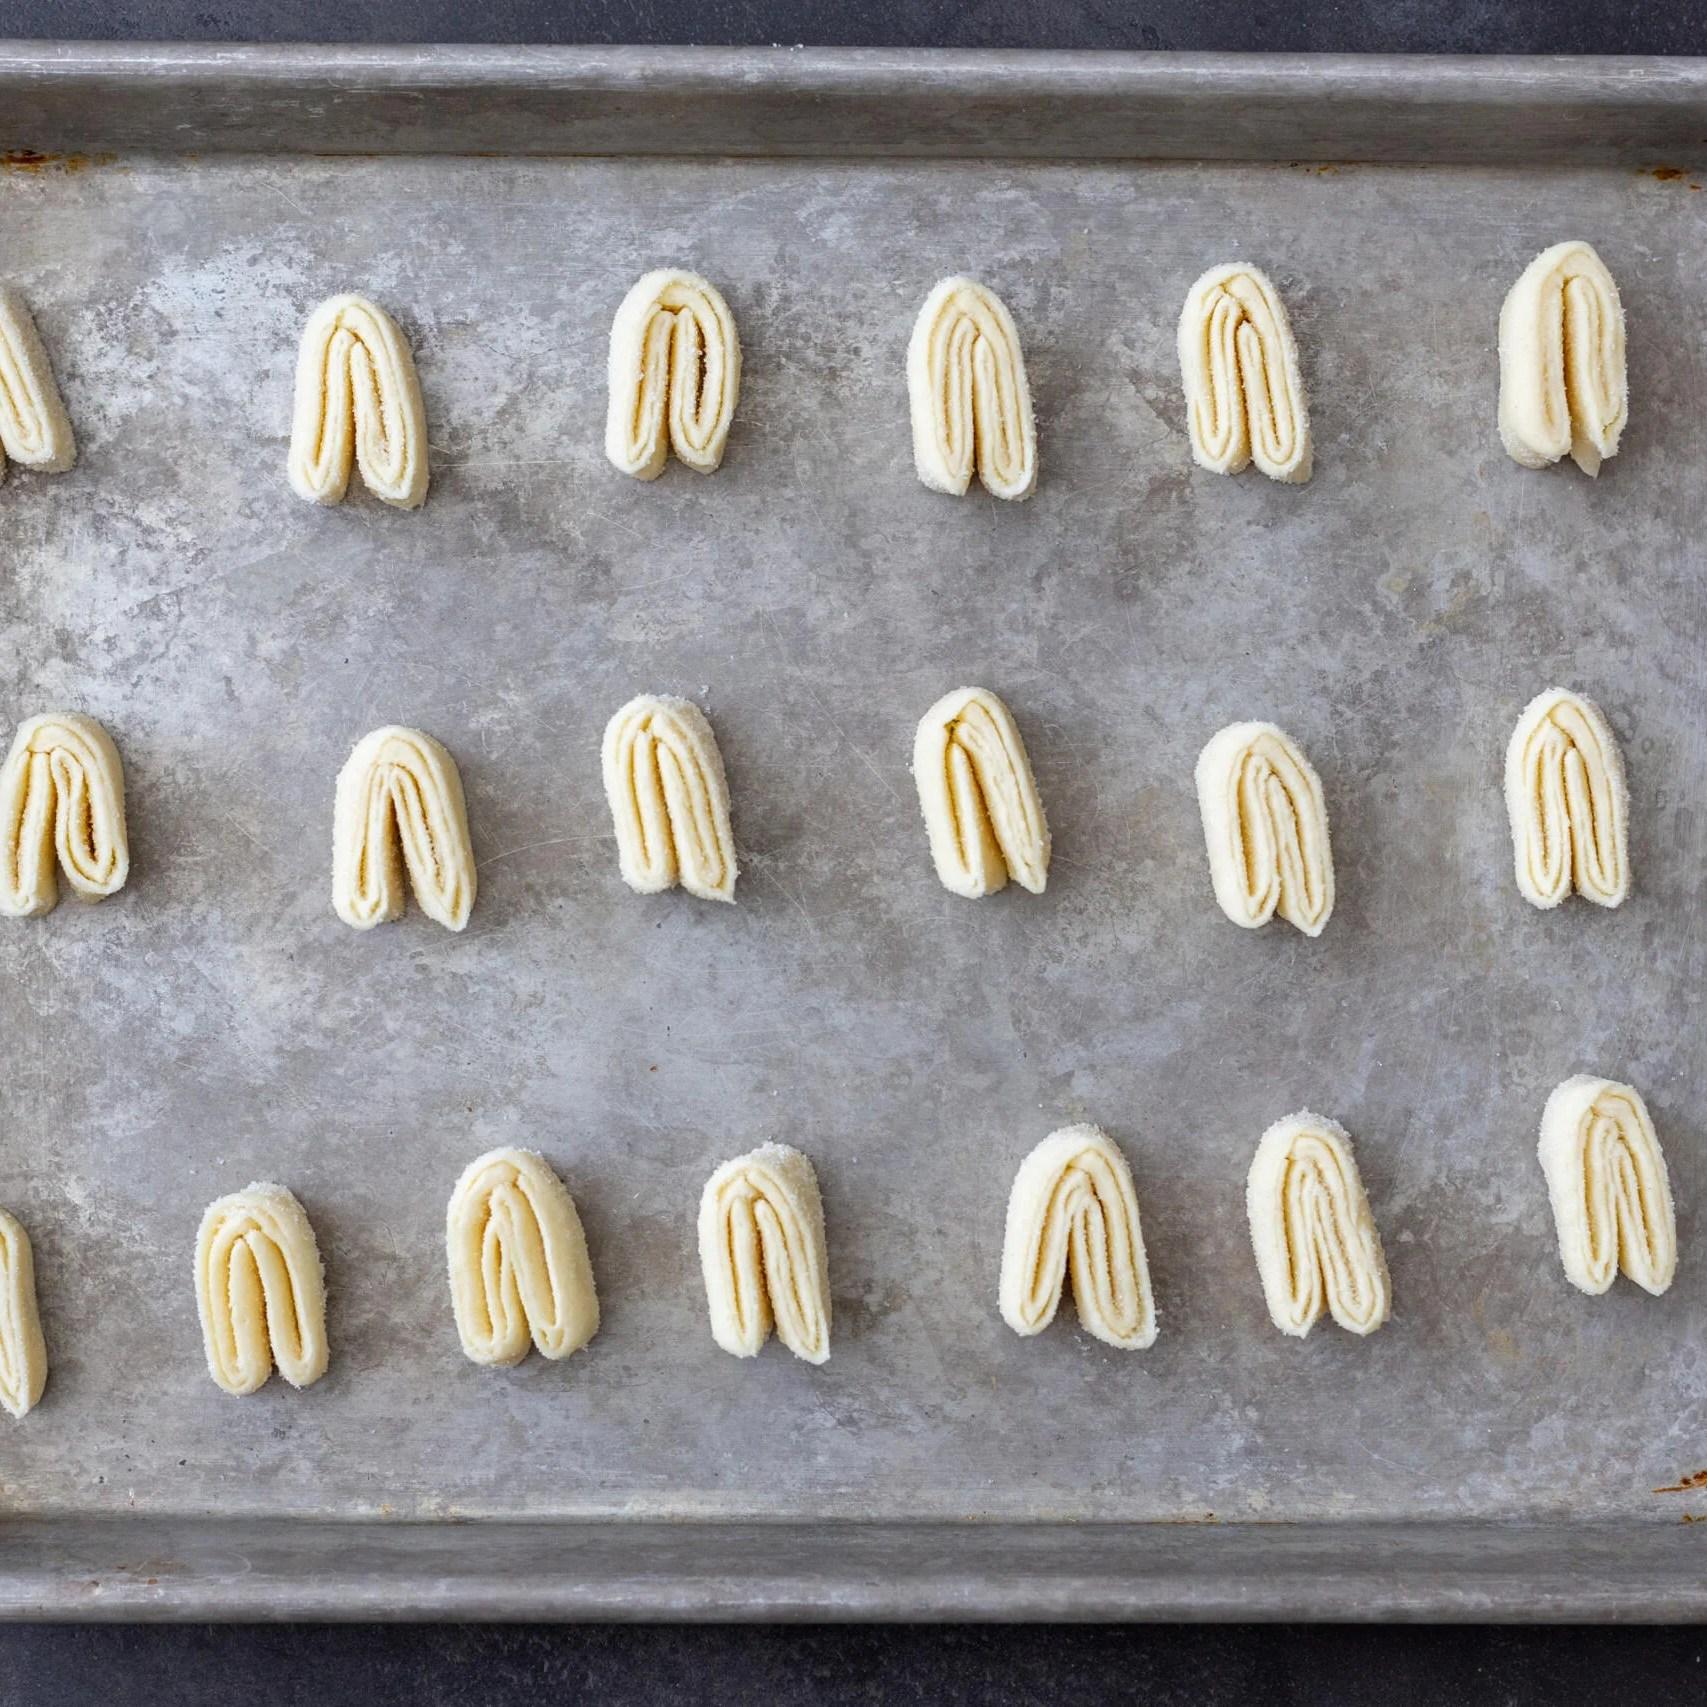 Palmier cookie dough on a baking sheet